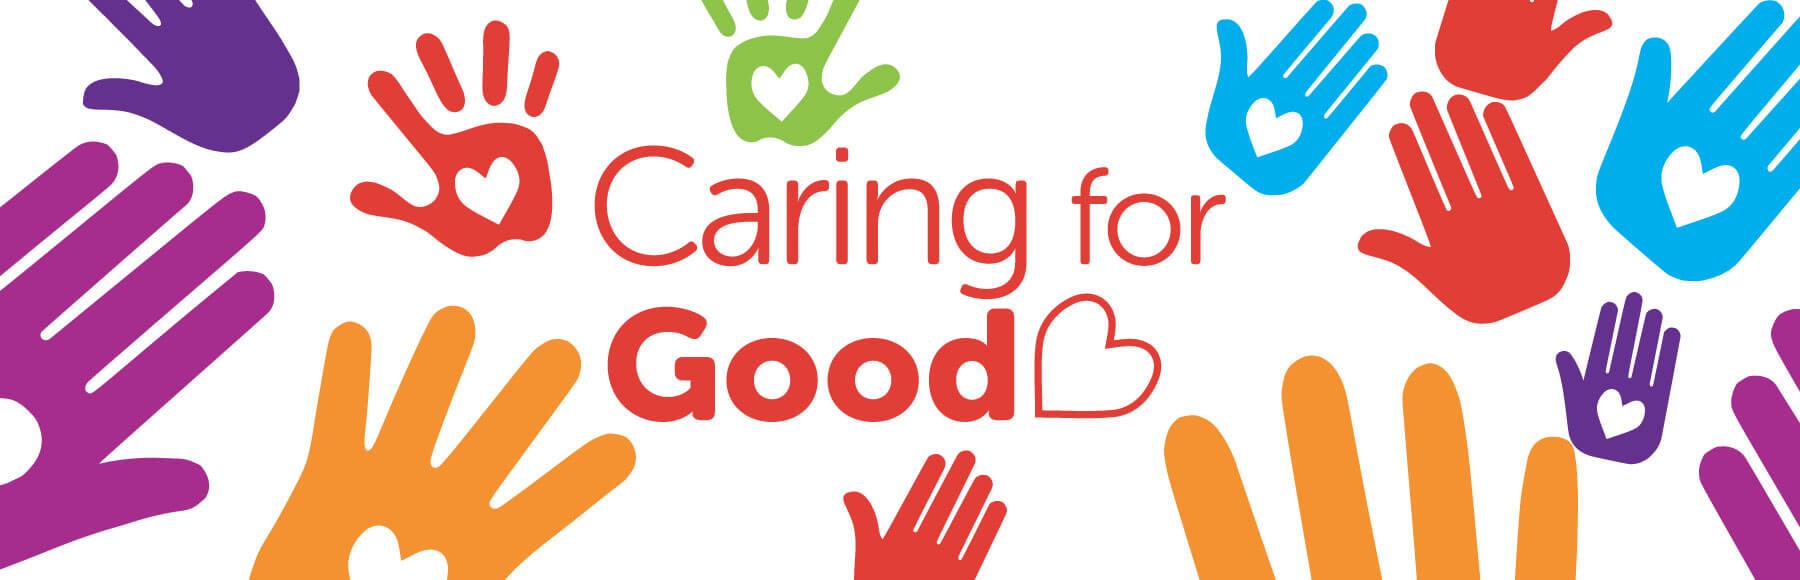 Caring 4 Good